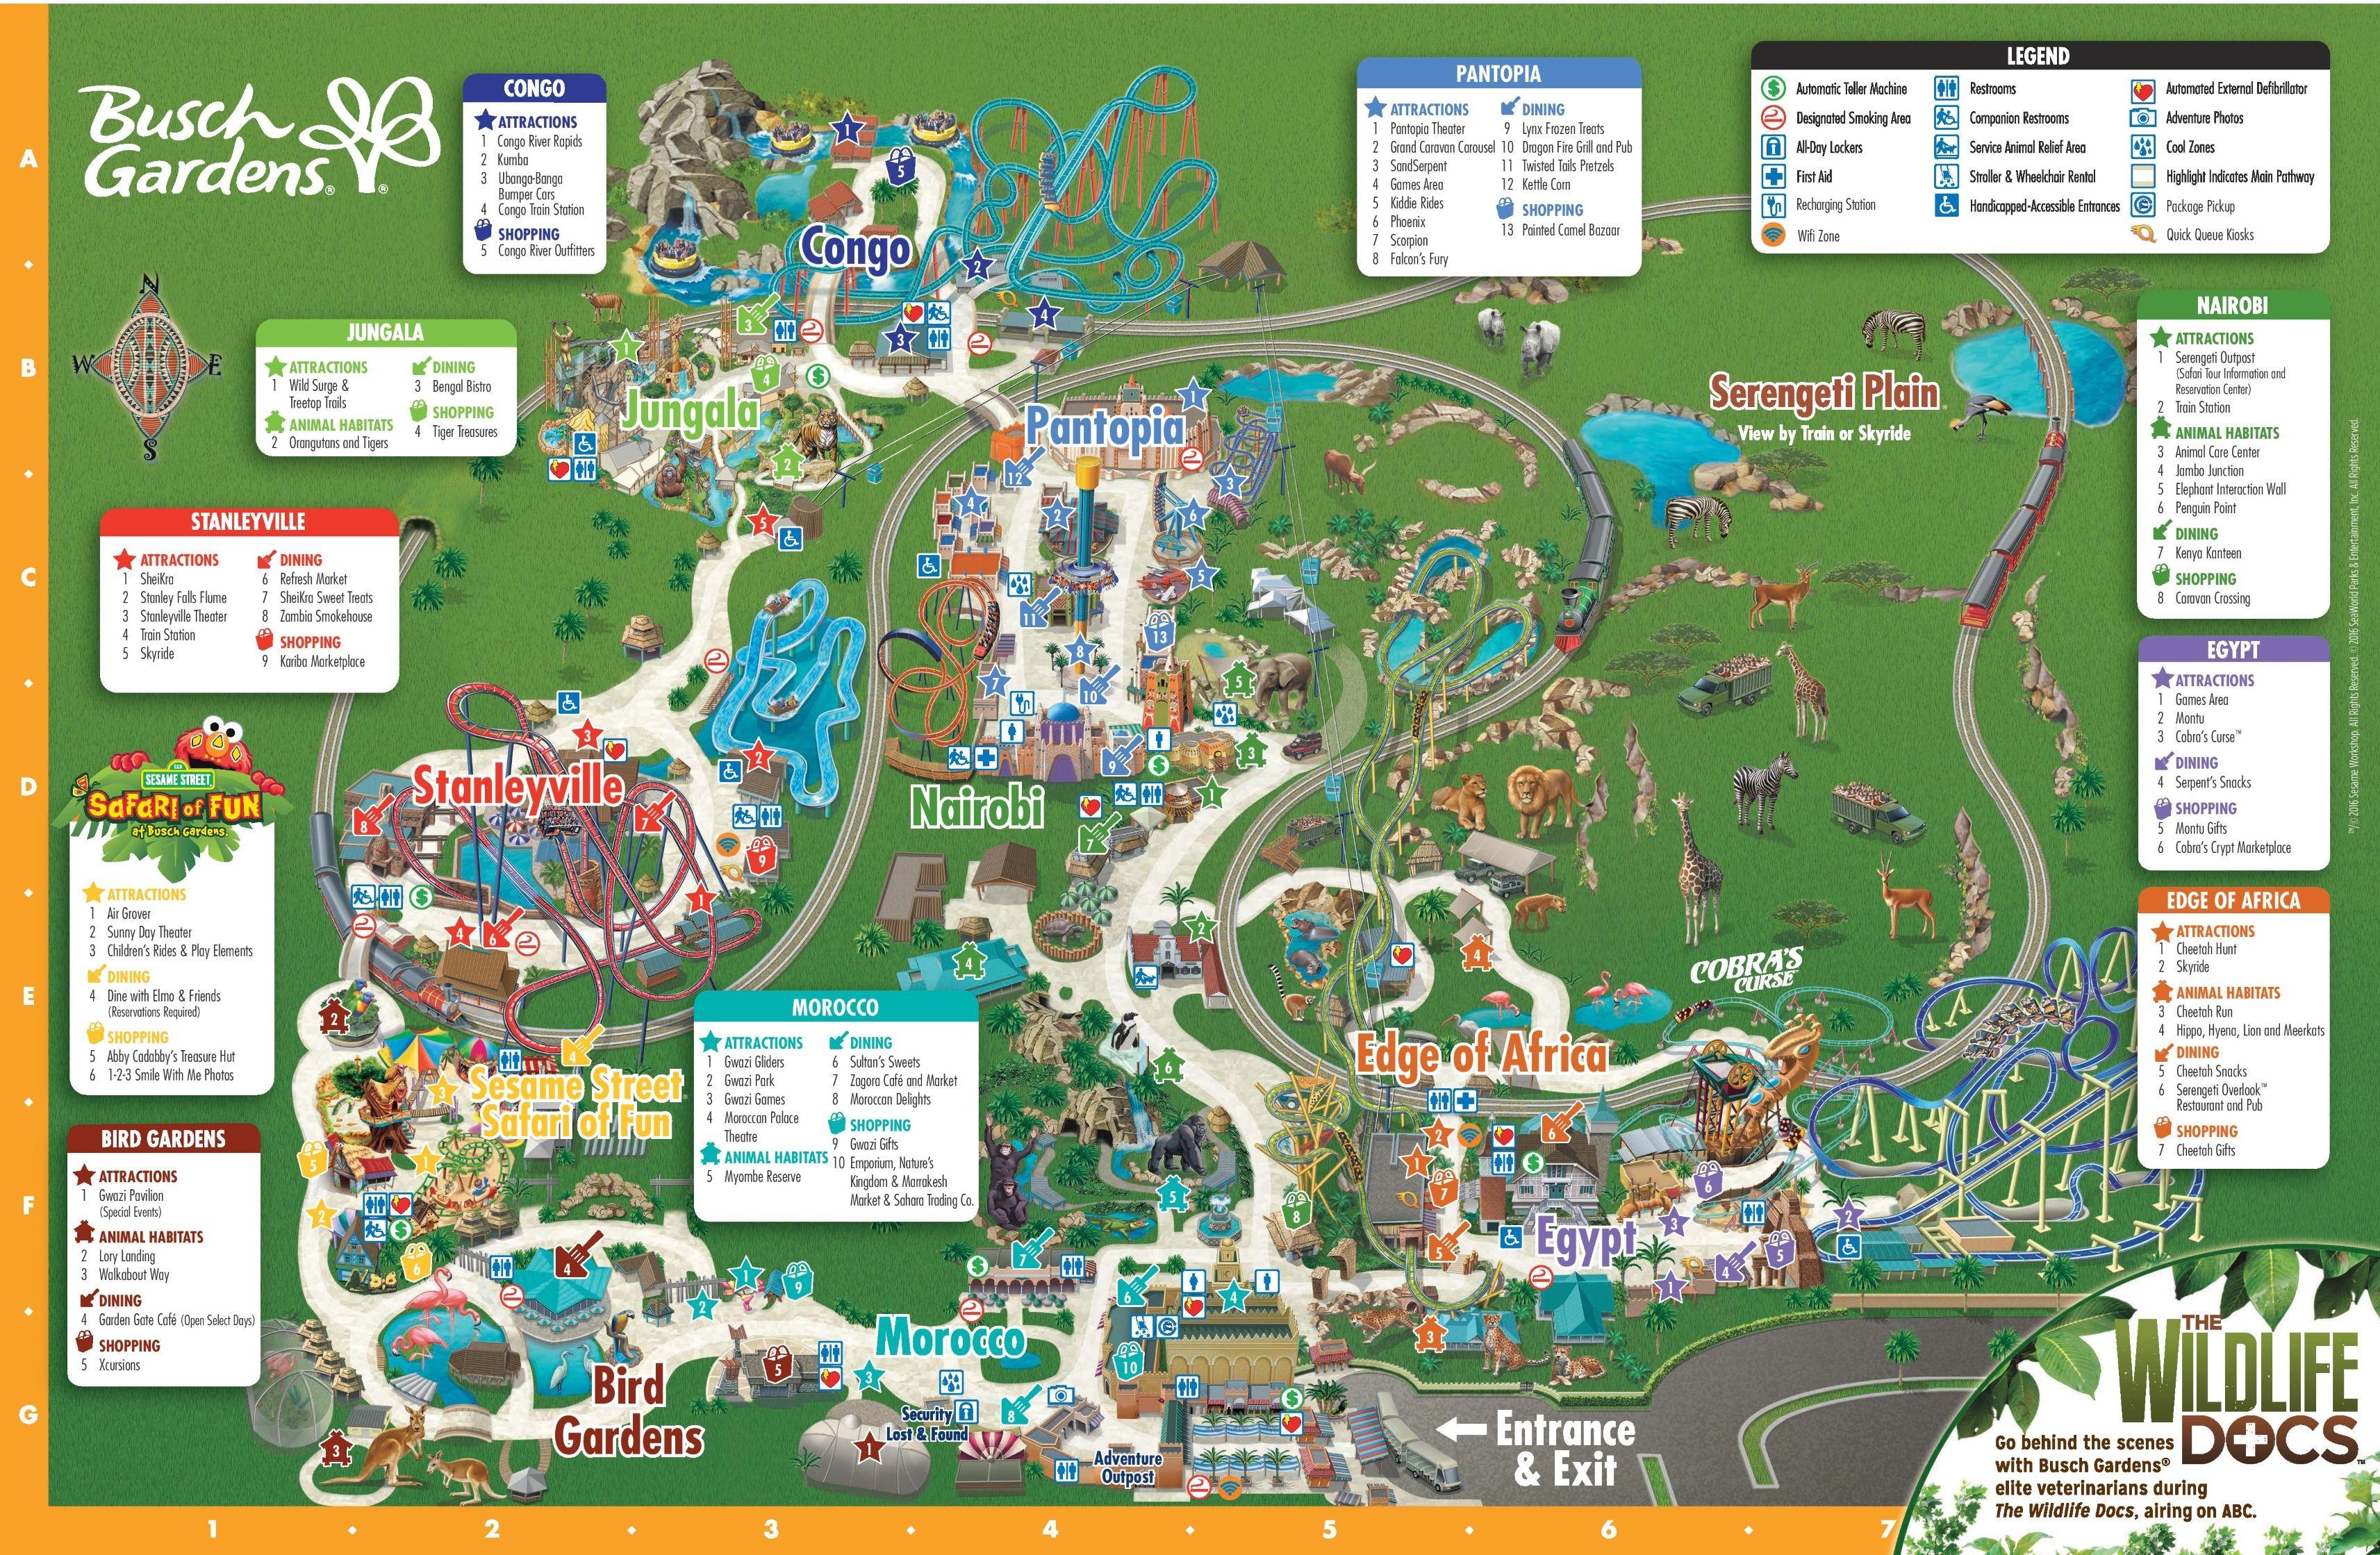 b2482f1ffe9af82348b132c16506696a - Busch Gardens Tampa Christmas Town Map